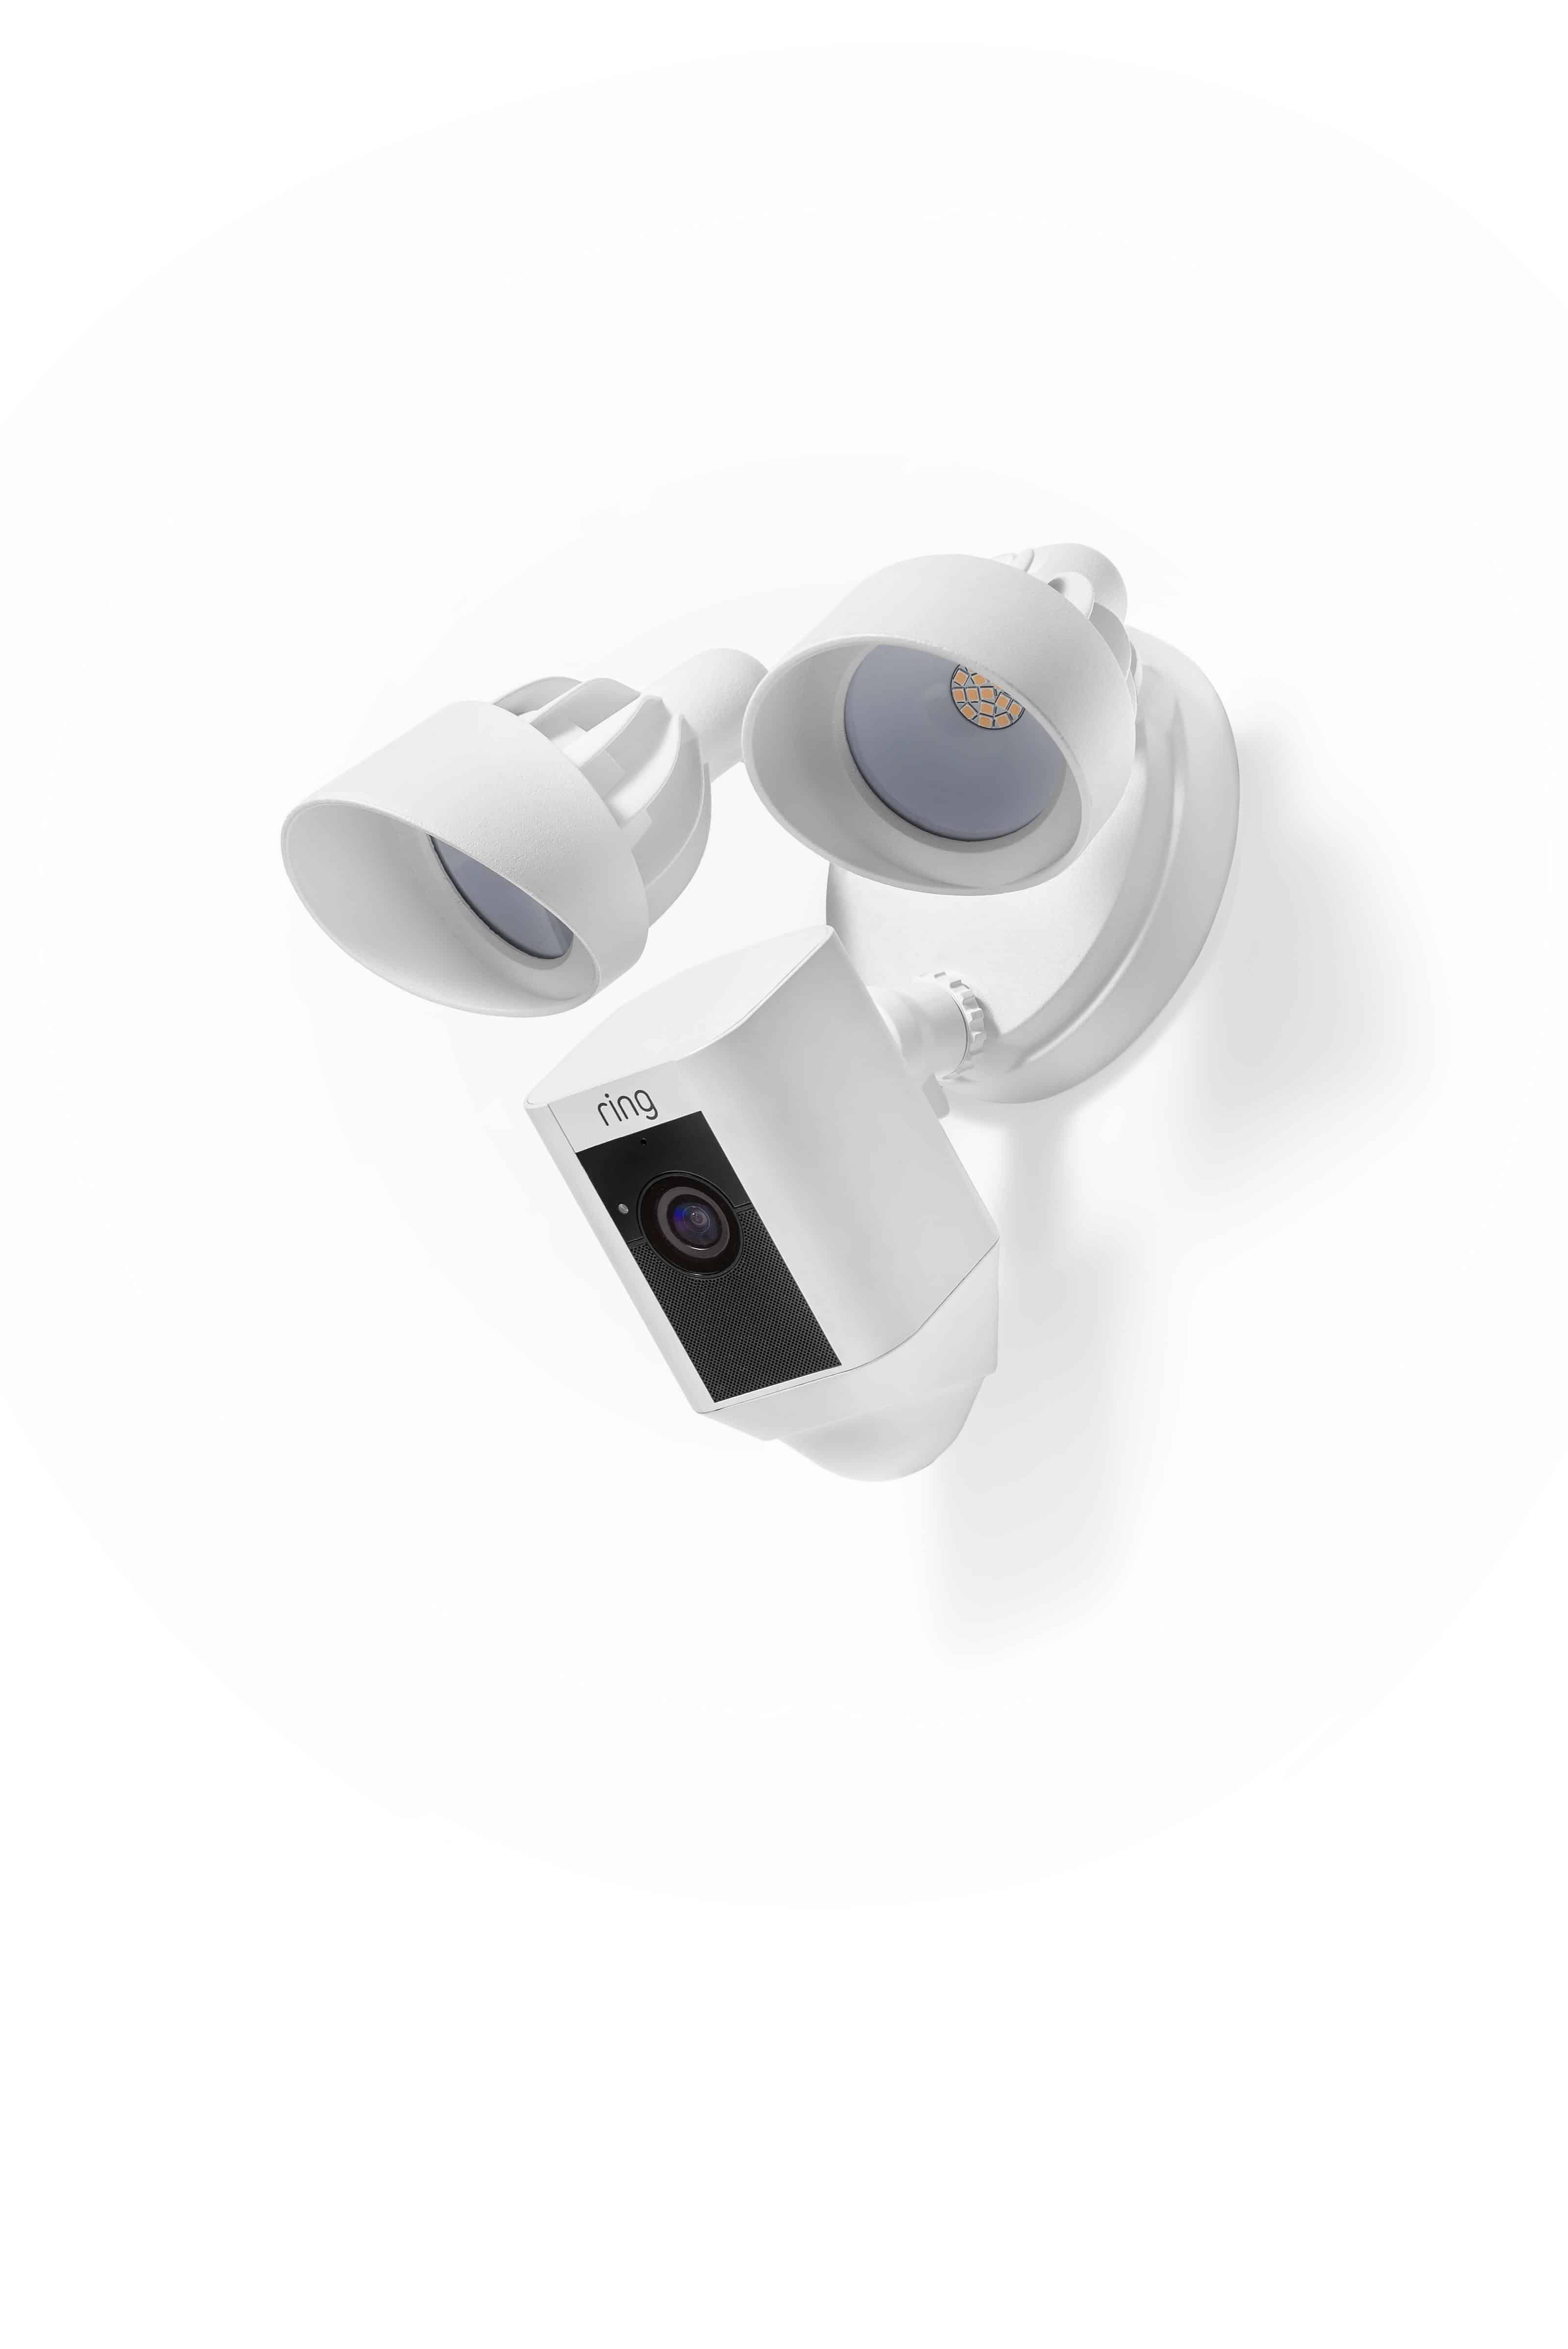 Ring Floodlight Cam 1